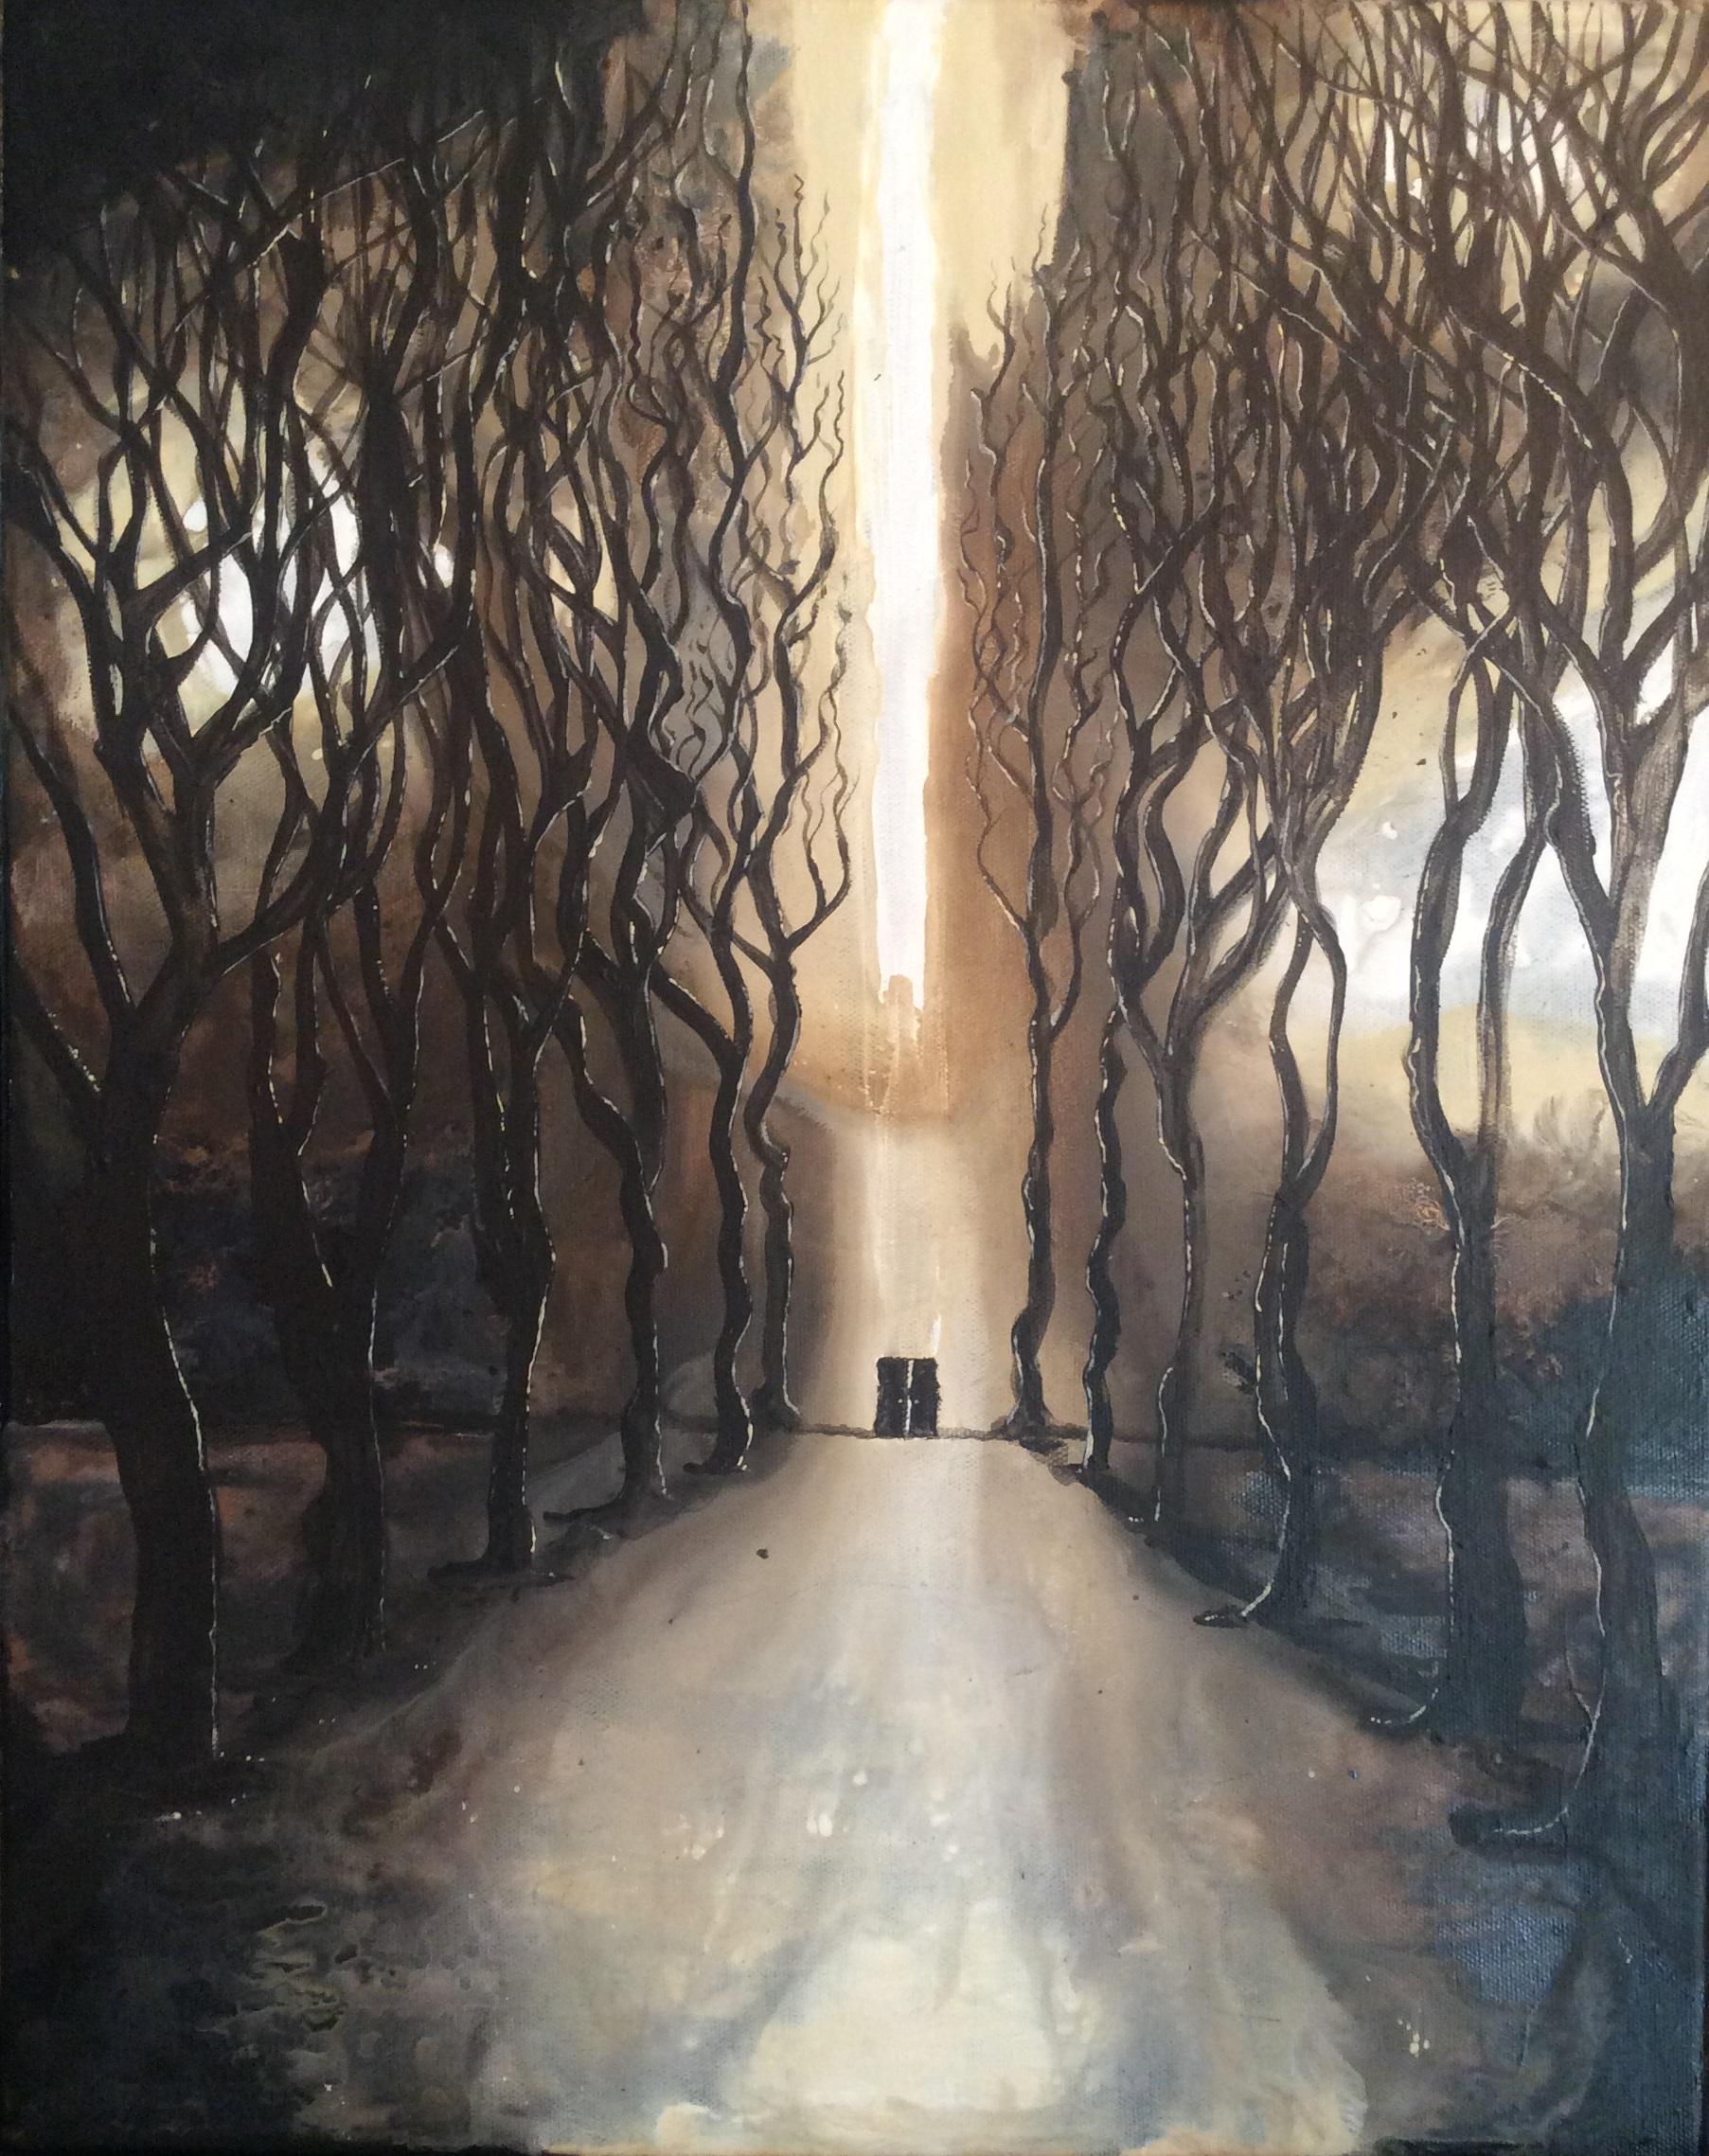 'The Corridor' - J Edward Neill - 2019